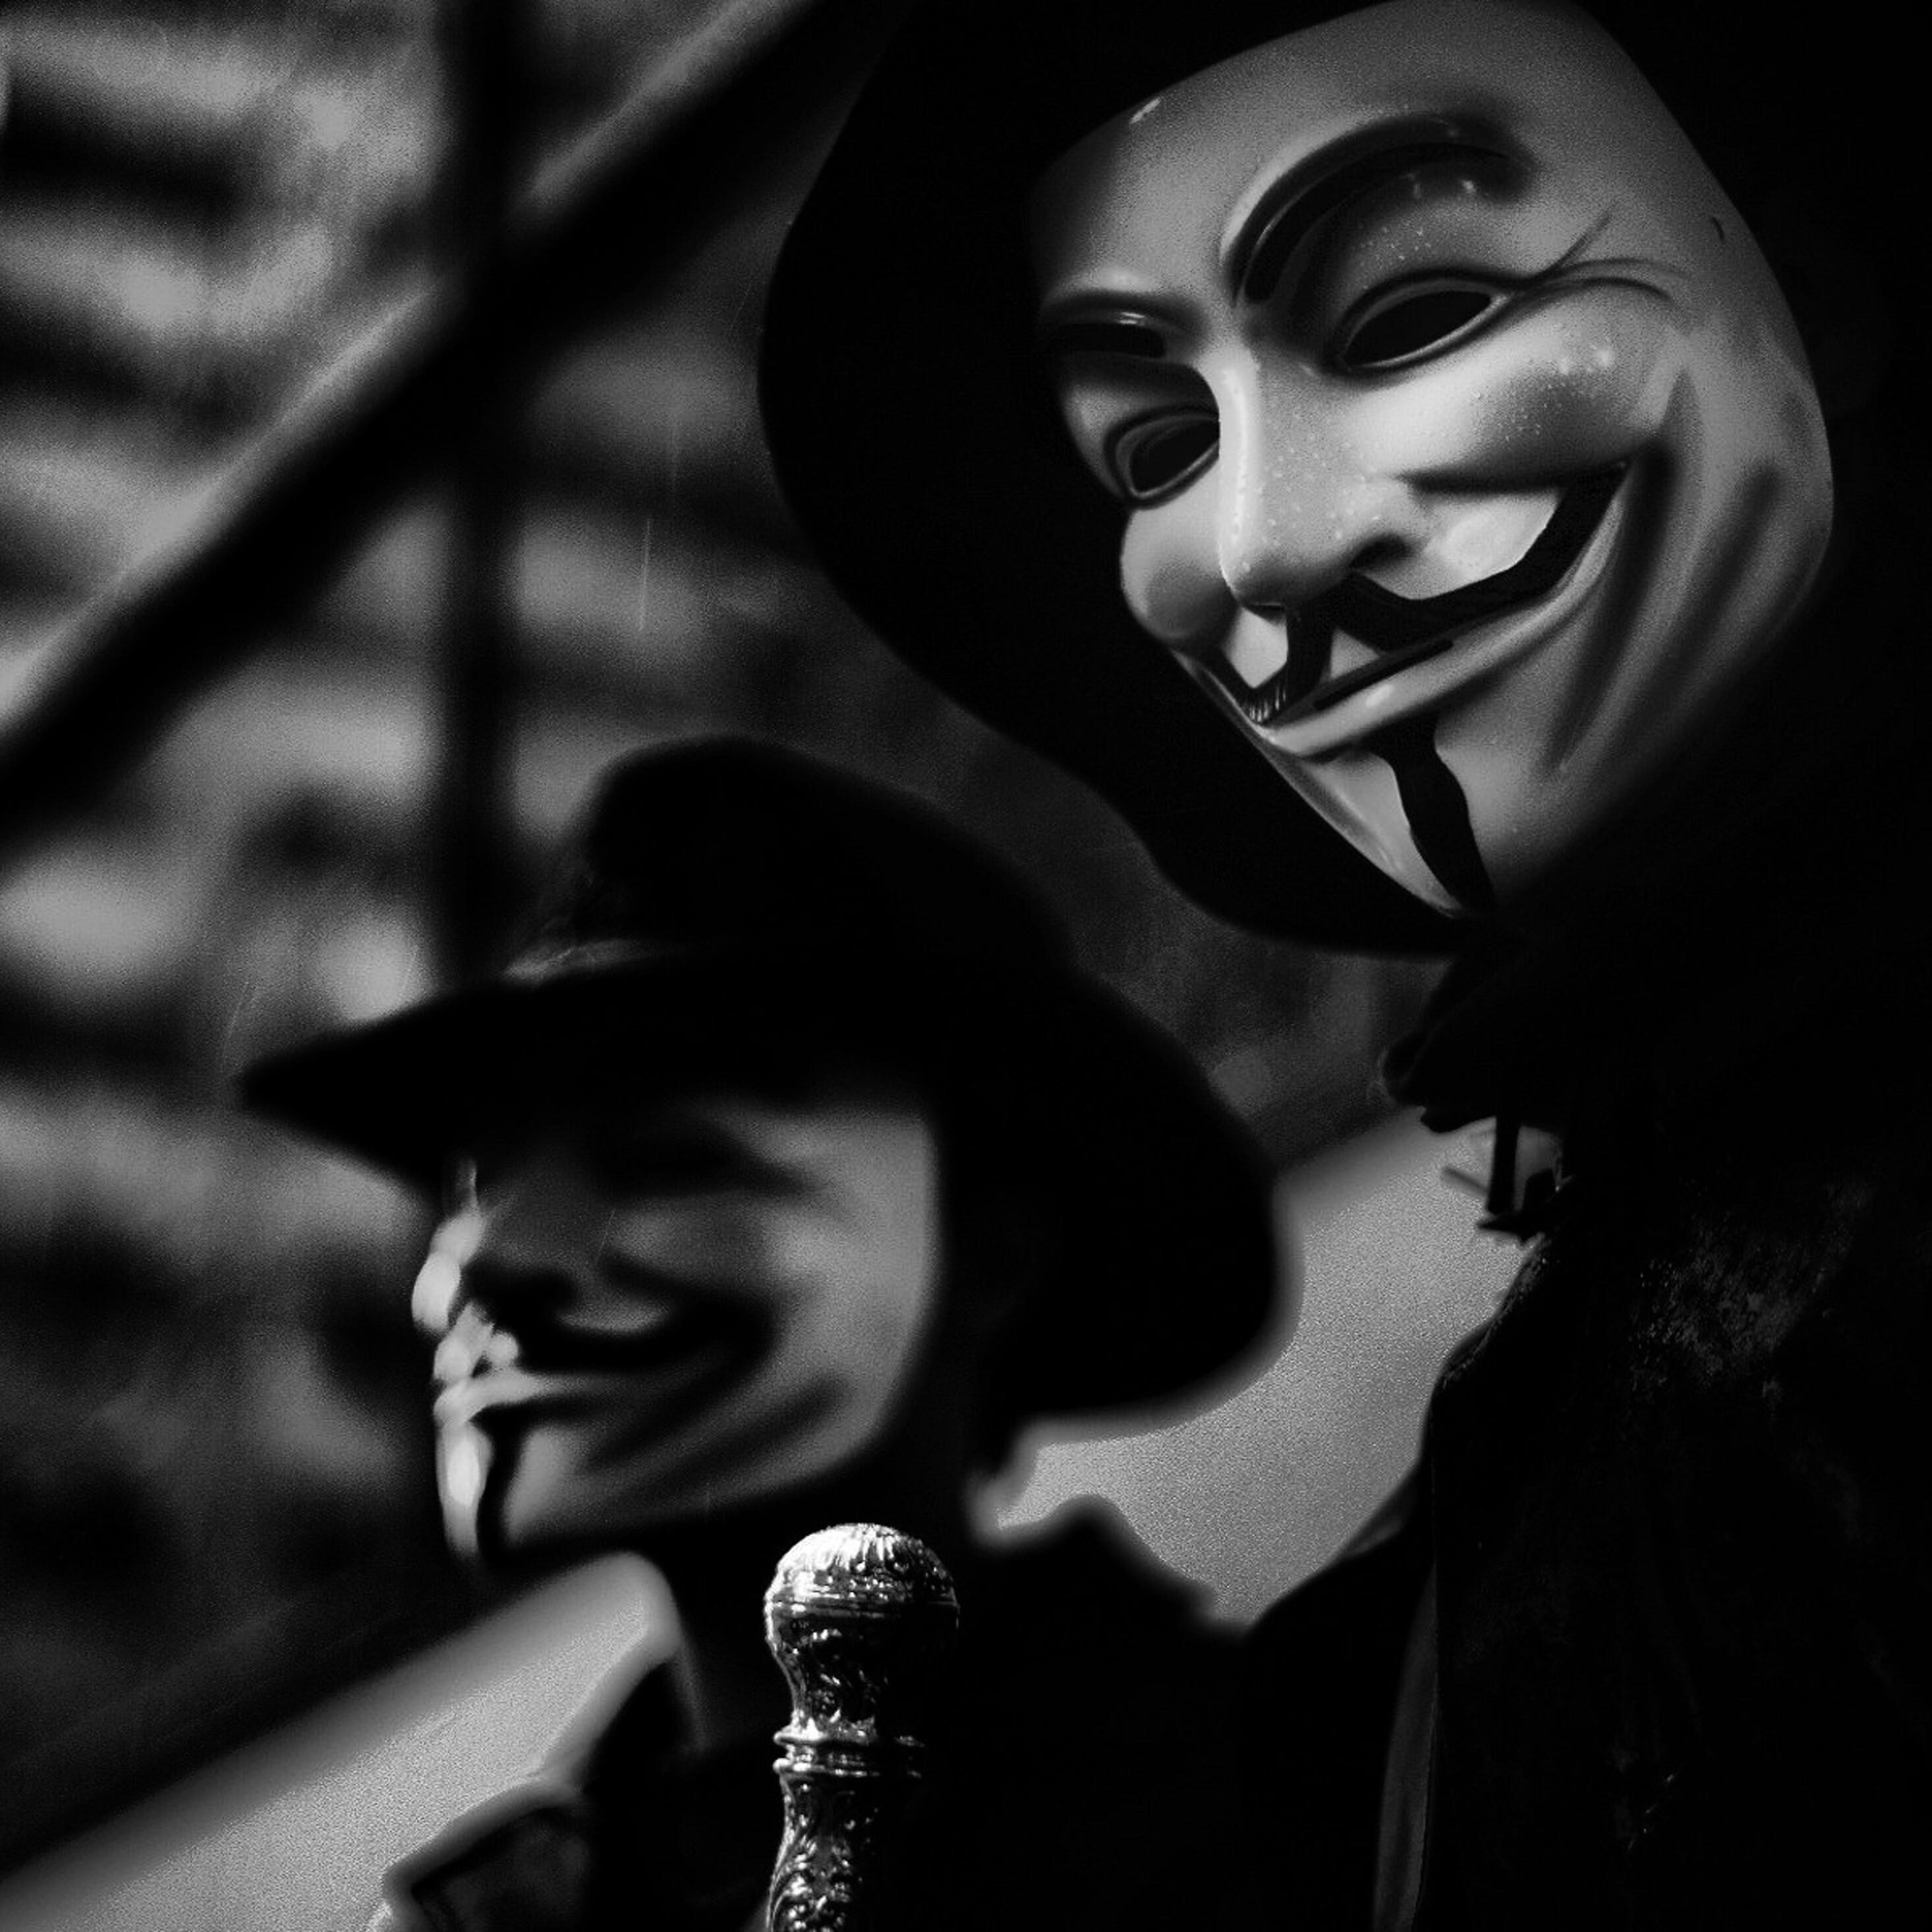 anonymus-peoples-wallpaper.jpg